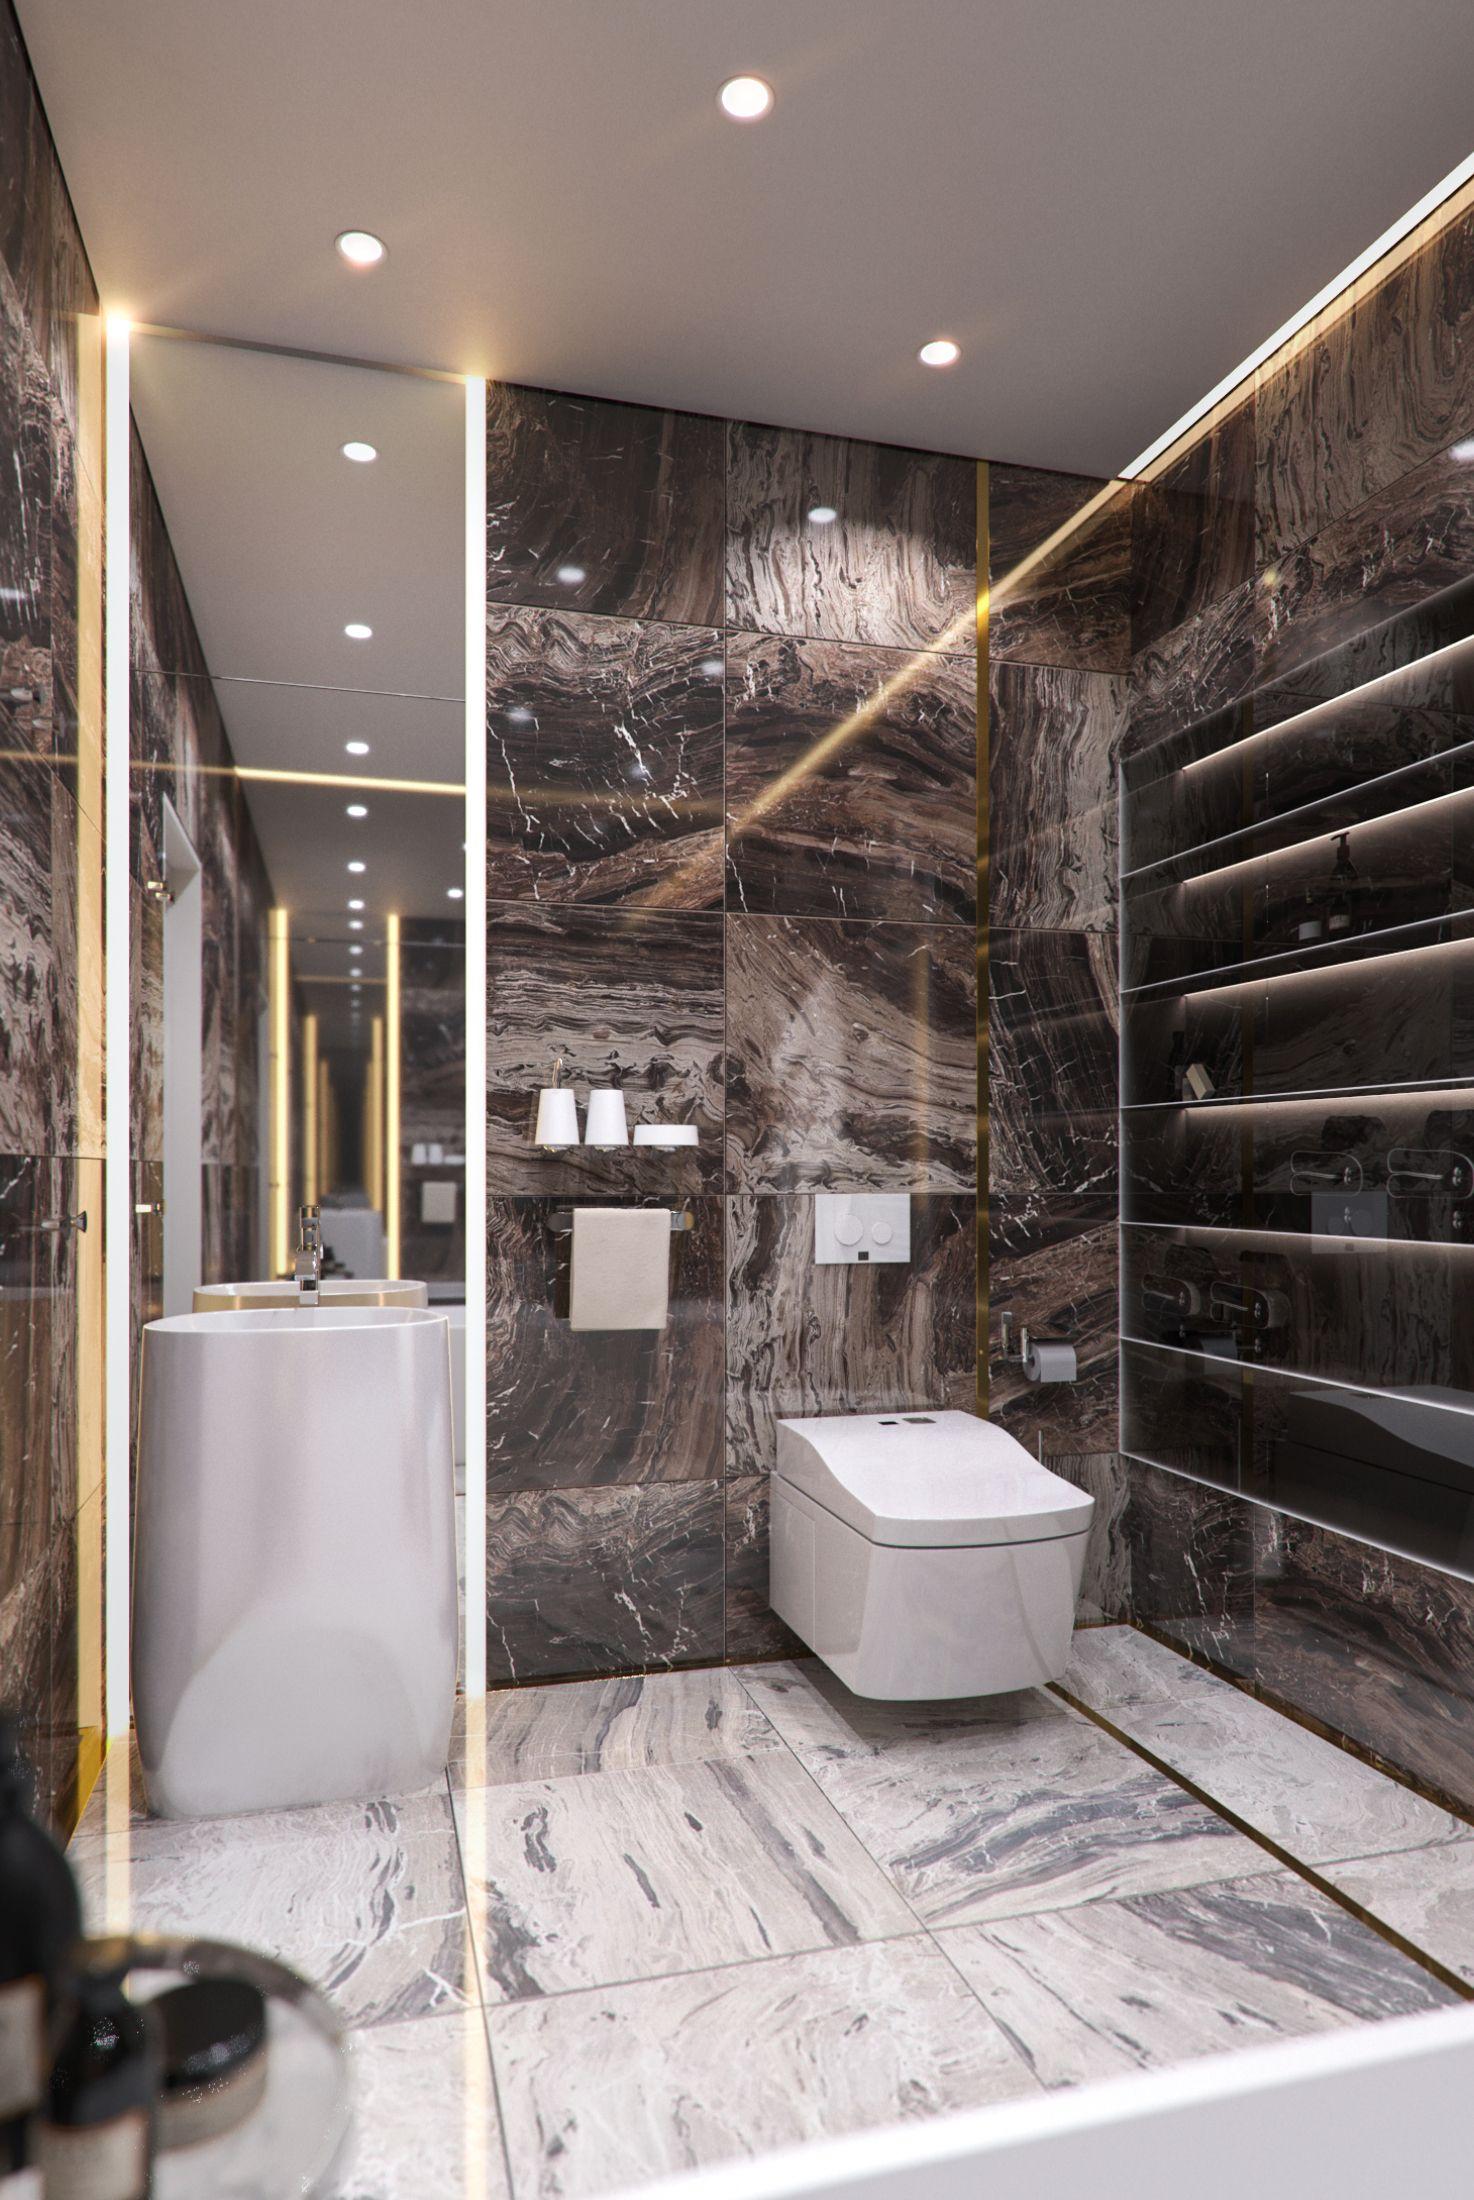 Calm Eclectic Interior Contemporary Bathroom Designs